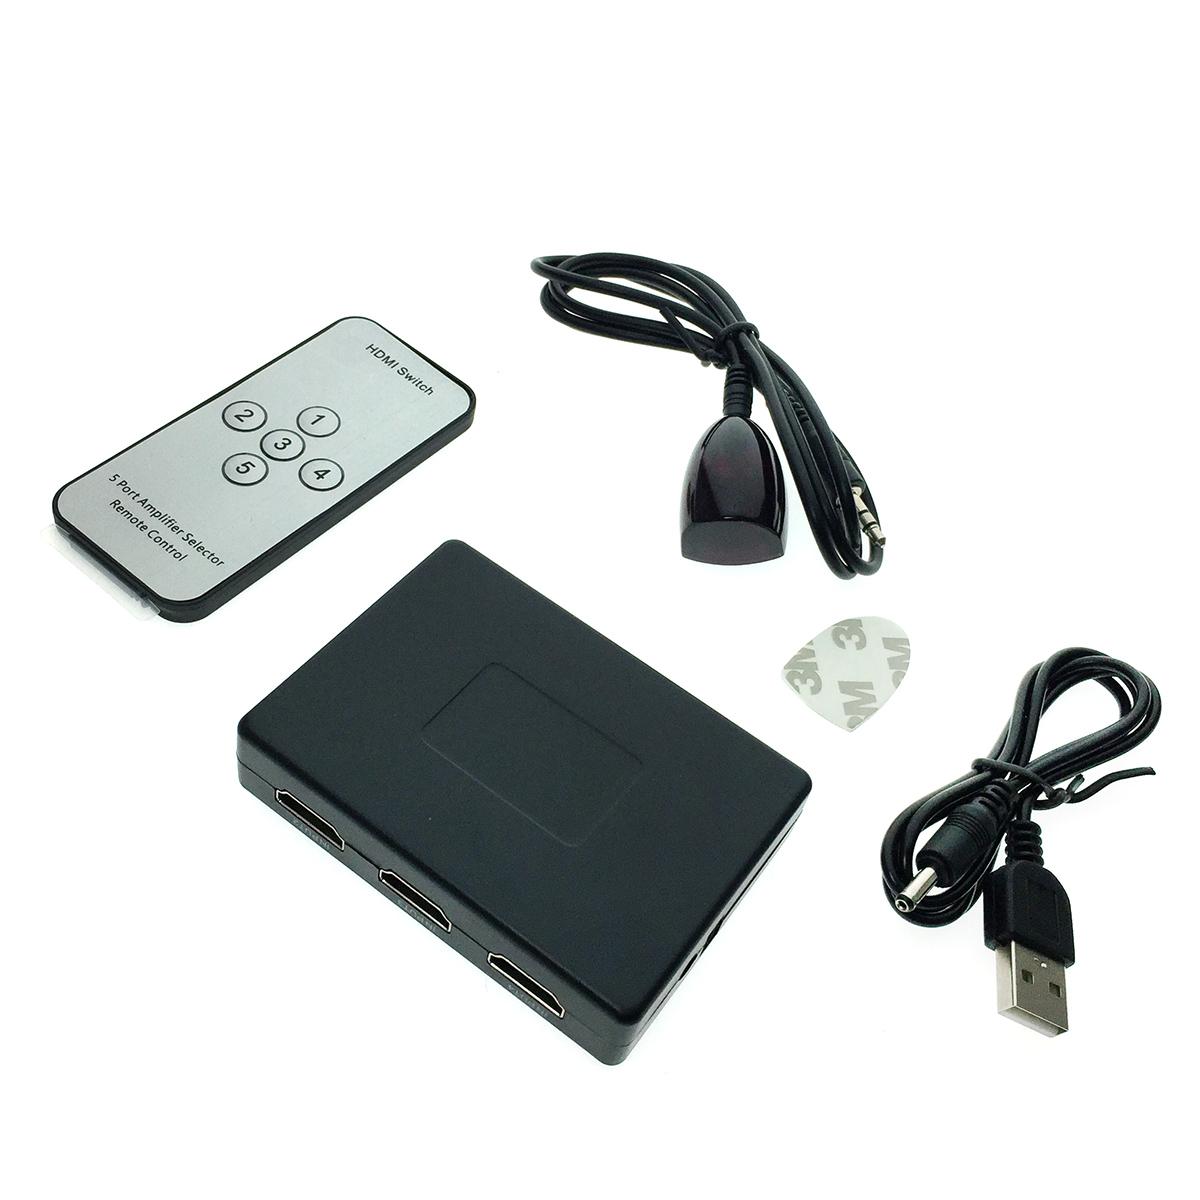 HDMI переключатель HDMI 5x1, Espada HSW0501S с пультом